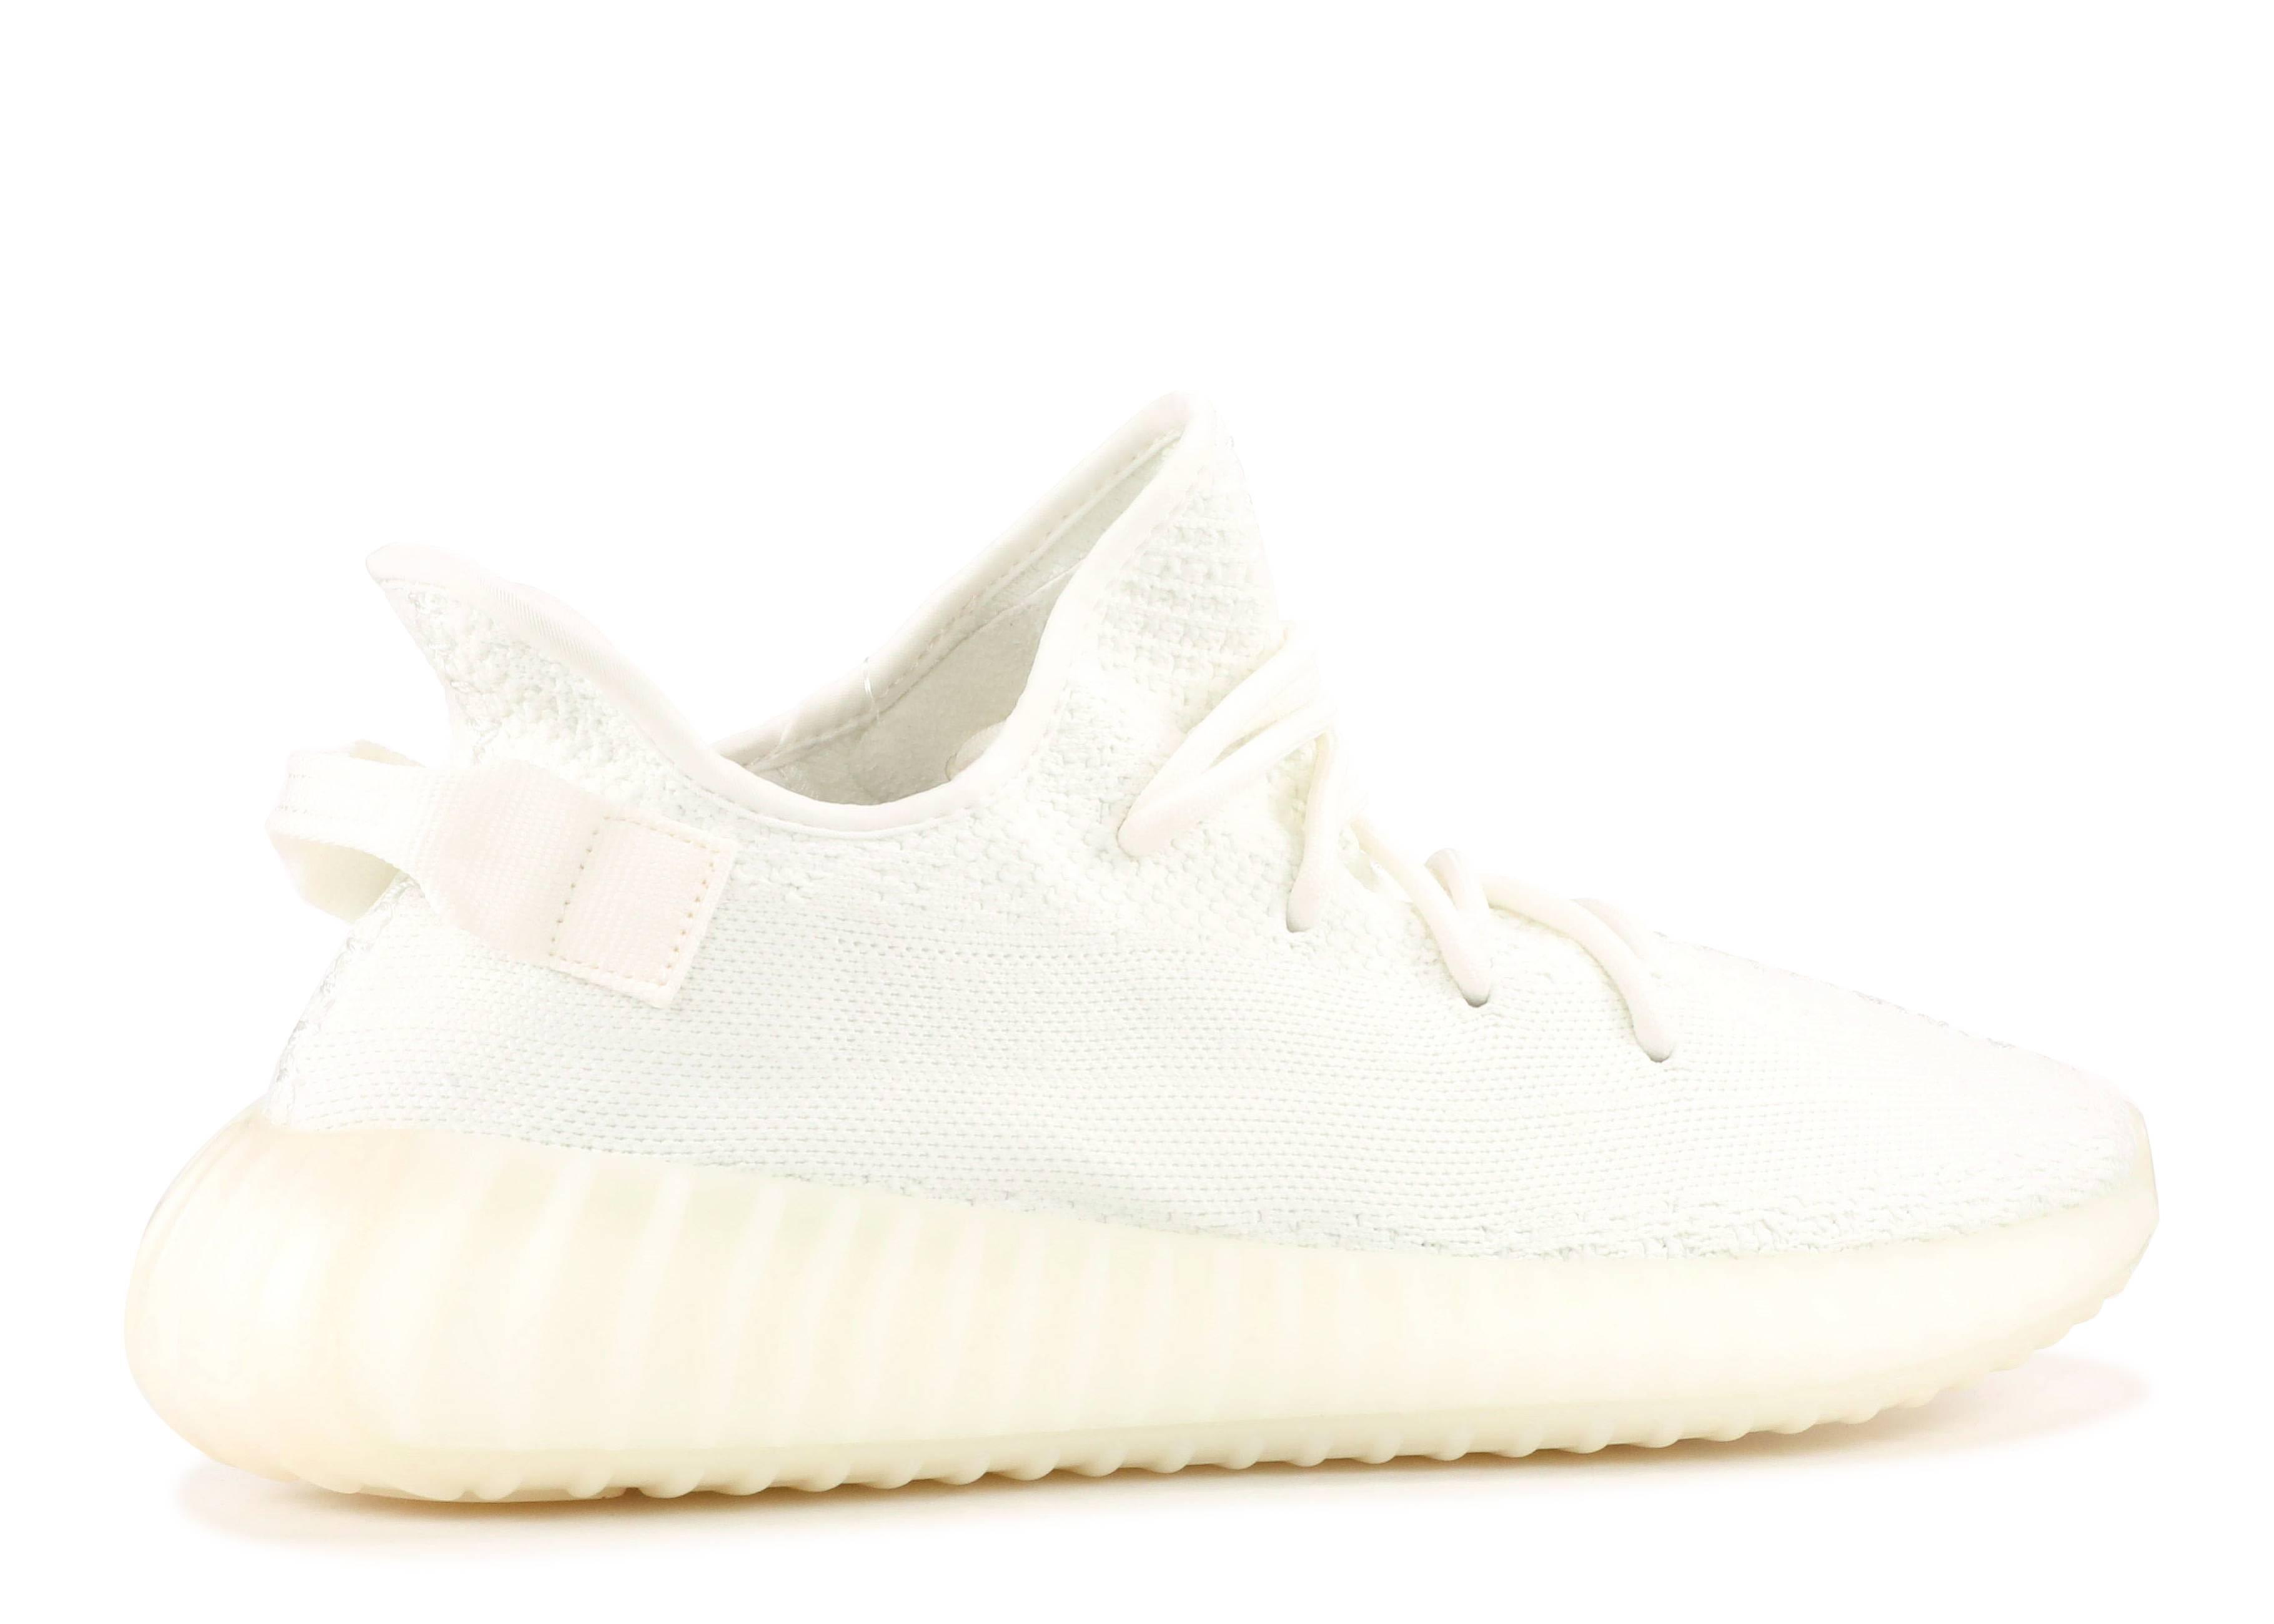 455bd877791 ... Yeezy Boost 350 V2  Cream White   Triple White